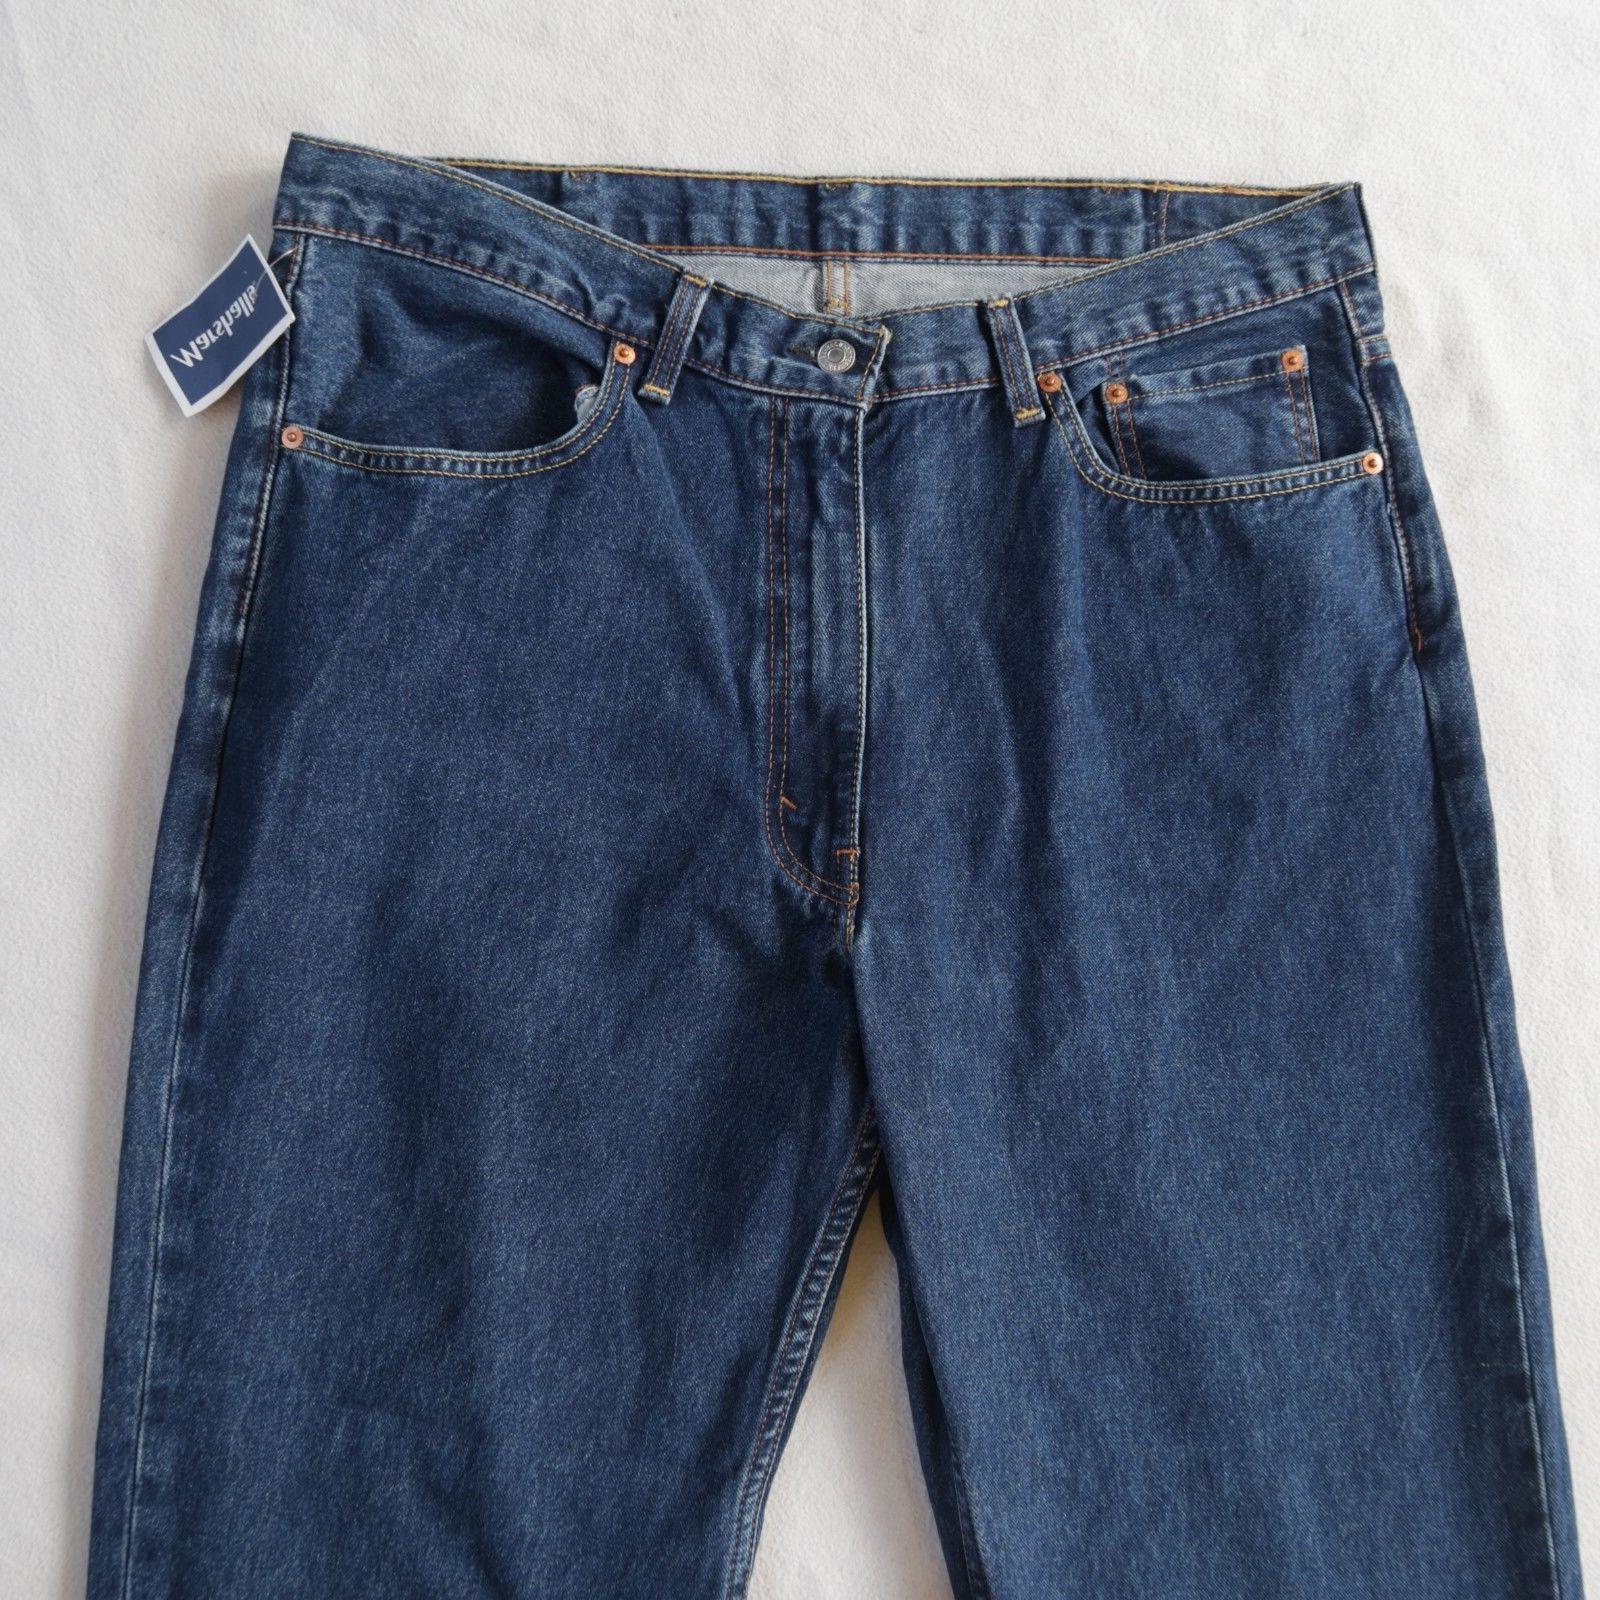 NWT Men's 514 Straight Dark Jeans 38x29